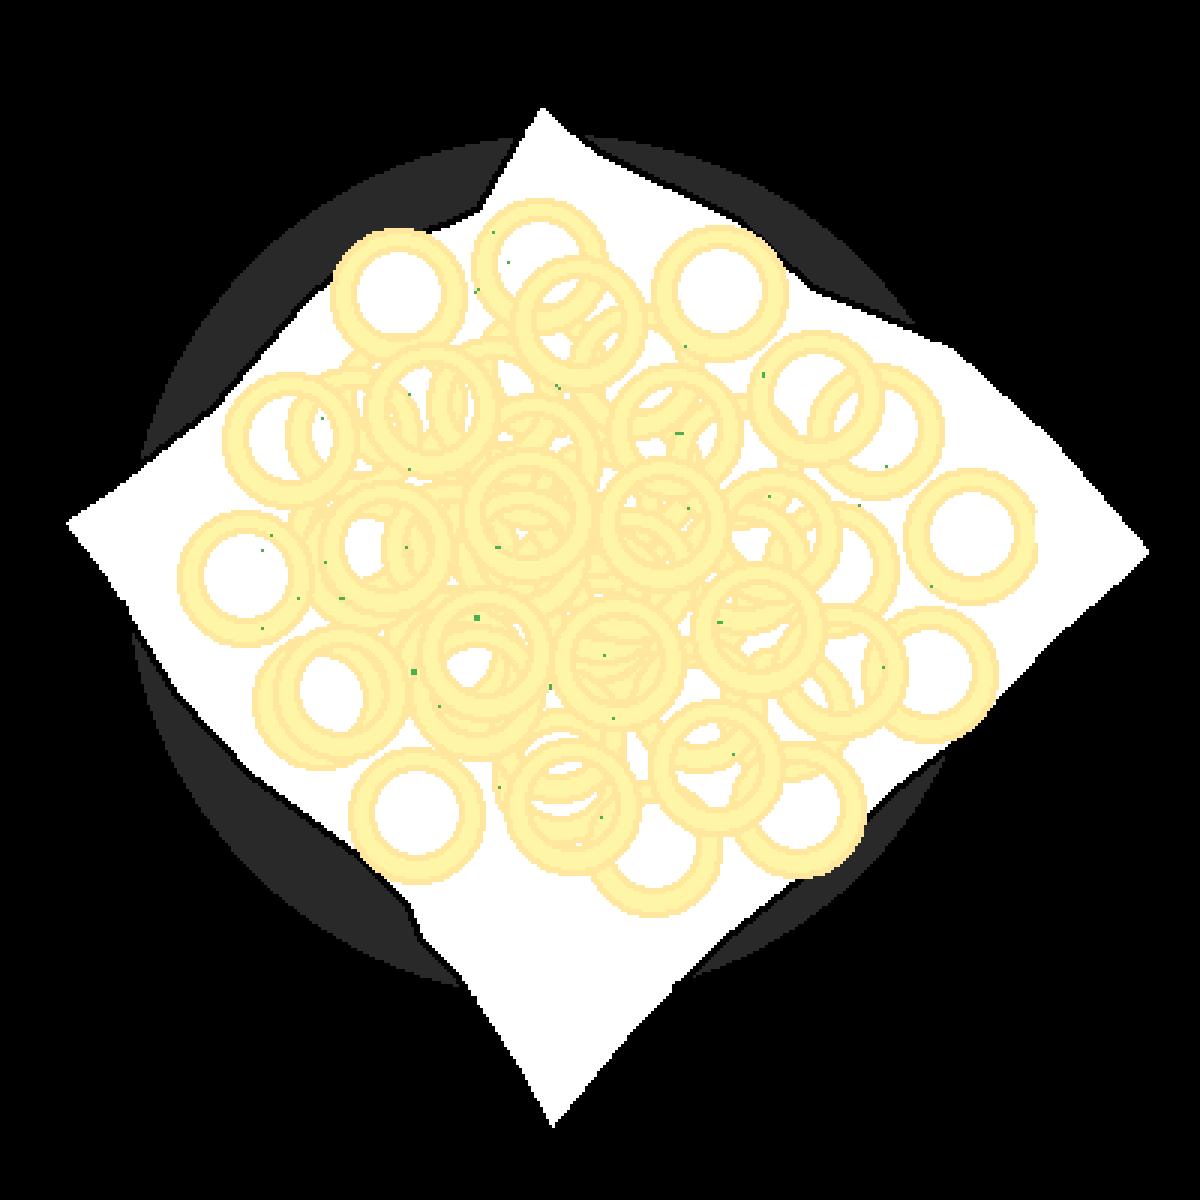 Calamari by Sketchboy123